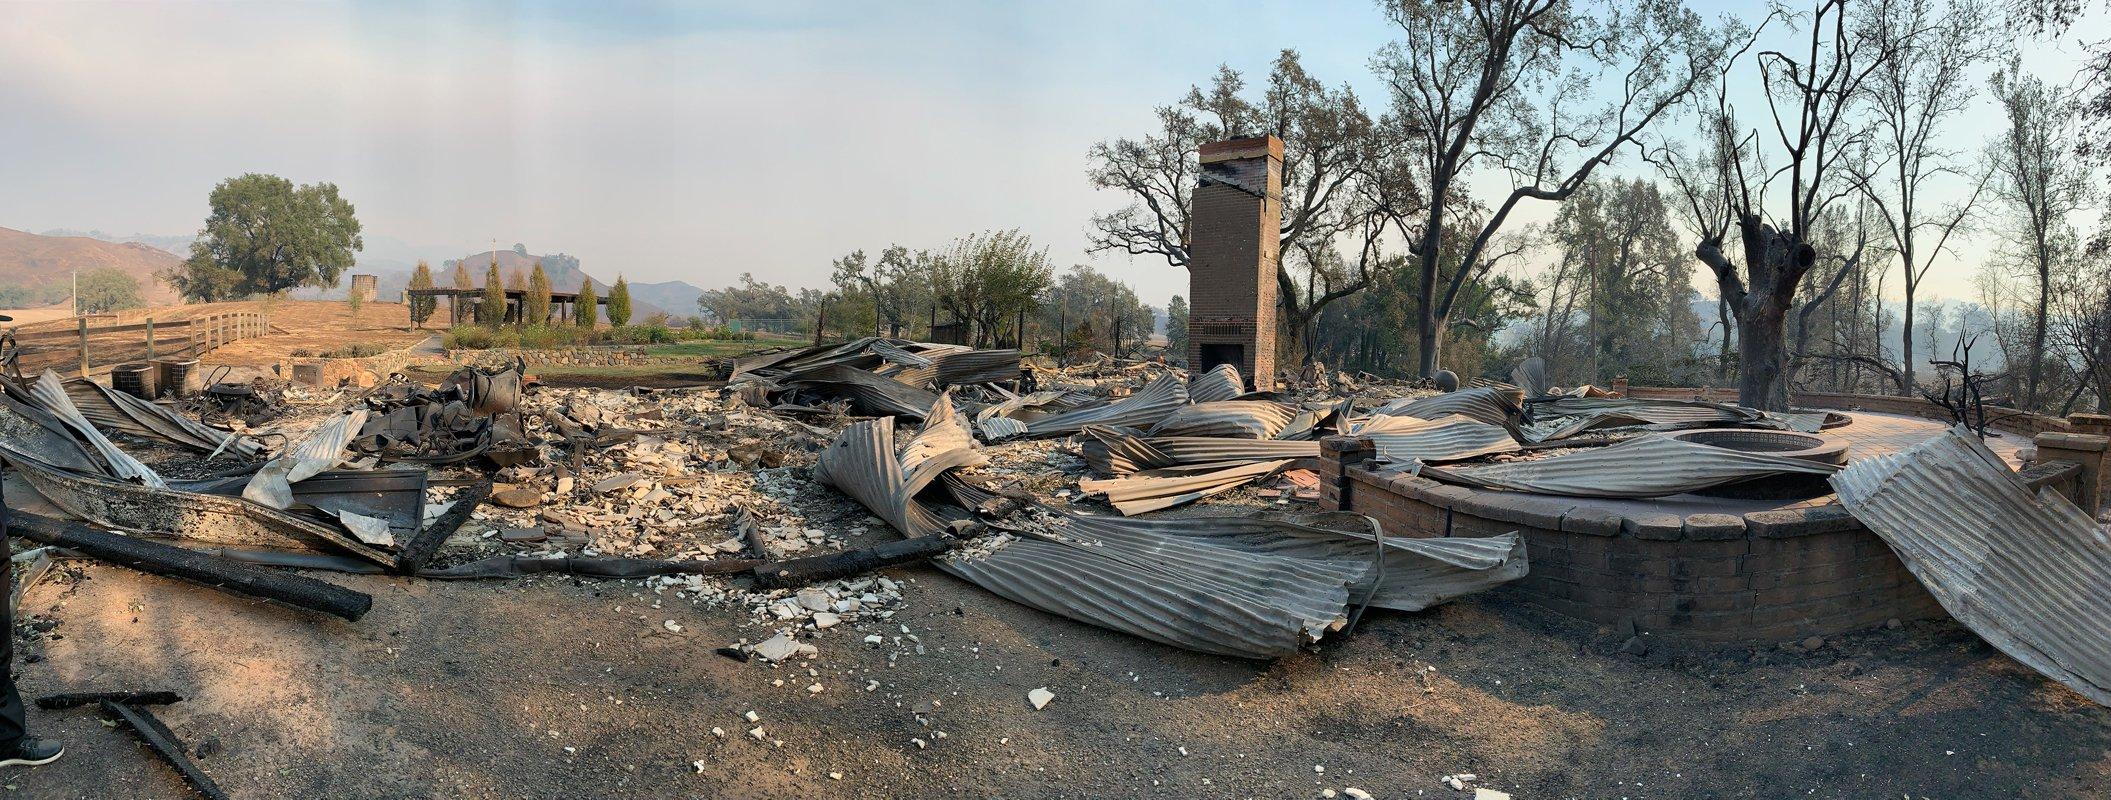 Scott Newman's farm after the fire. (Photo courtesy of Scott Newman)